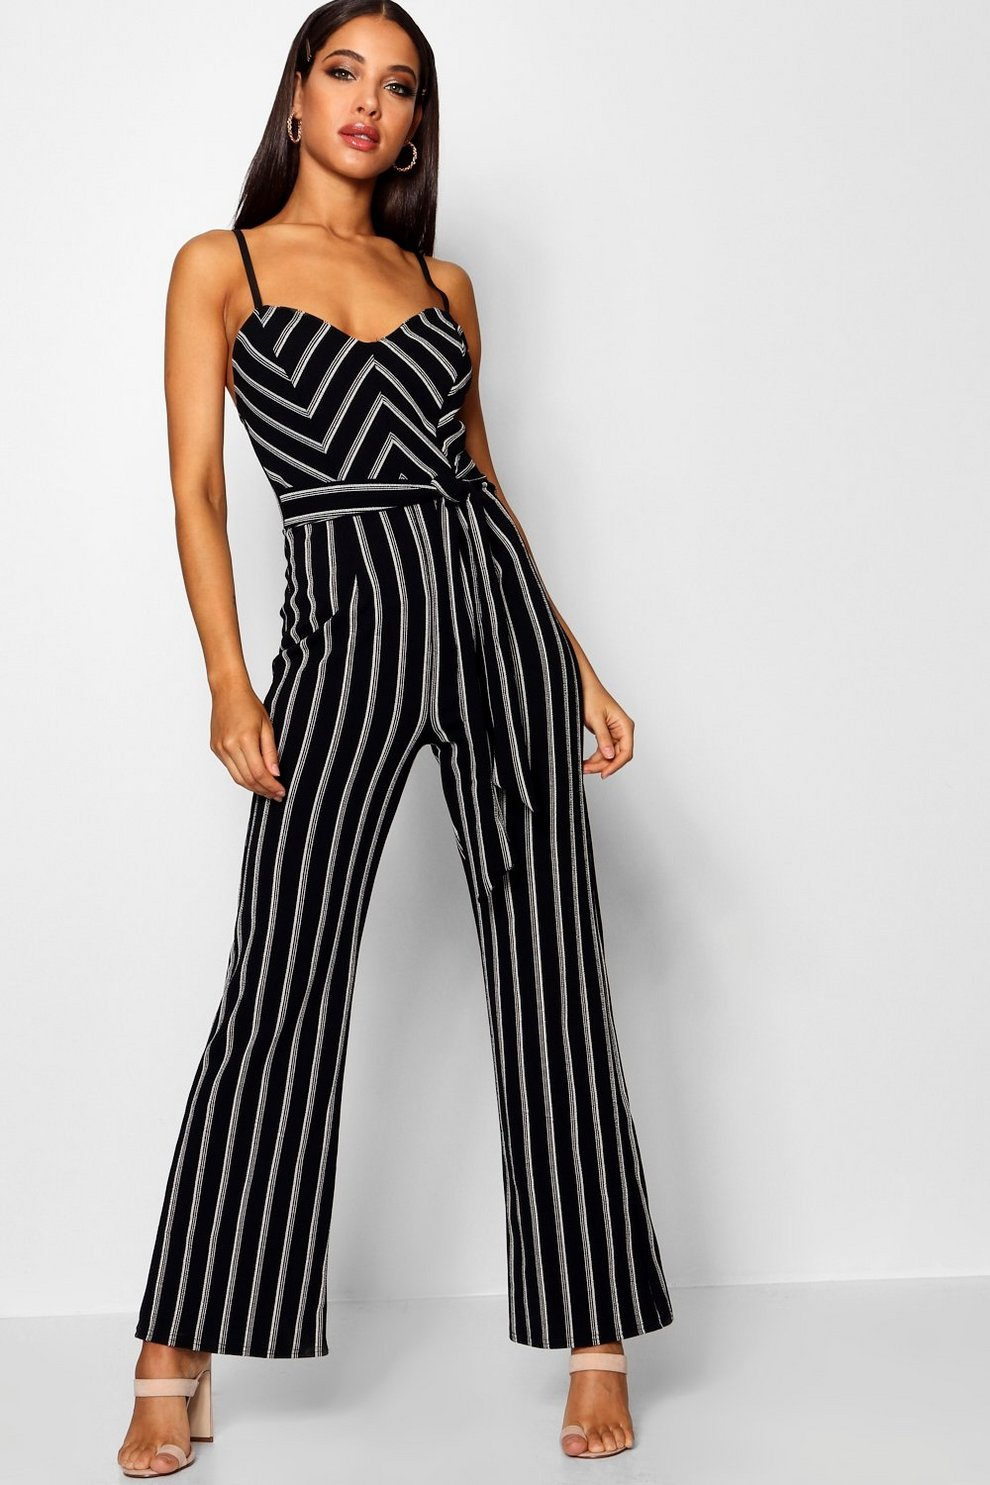 09d40f1387a5 Striped Wide Leg Belted Jumpsuit